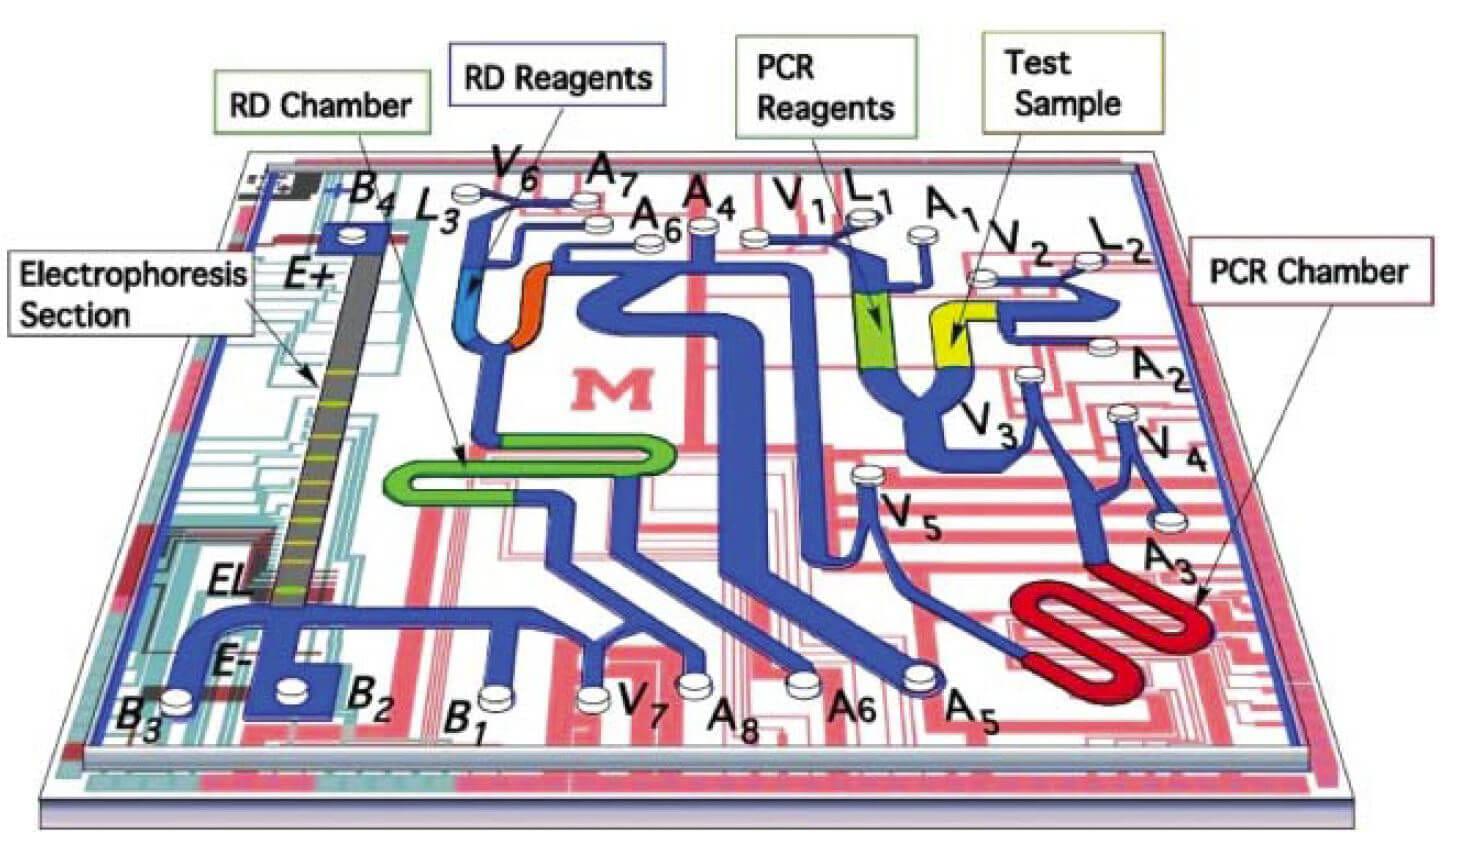 Microfluidic PCR & qPCR - Elveflow